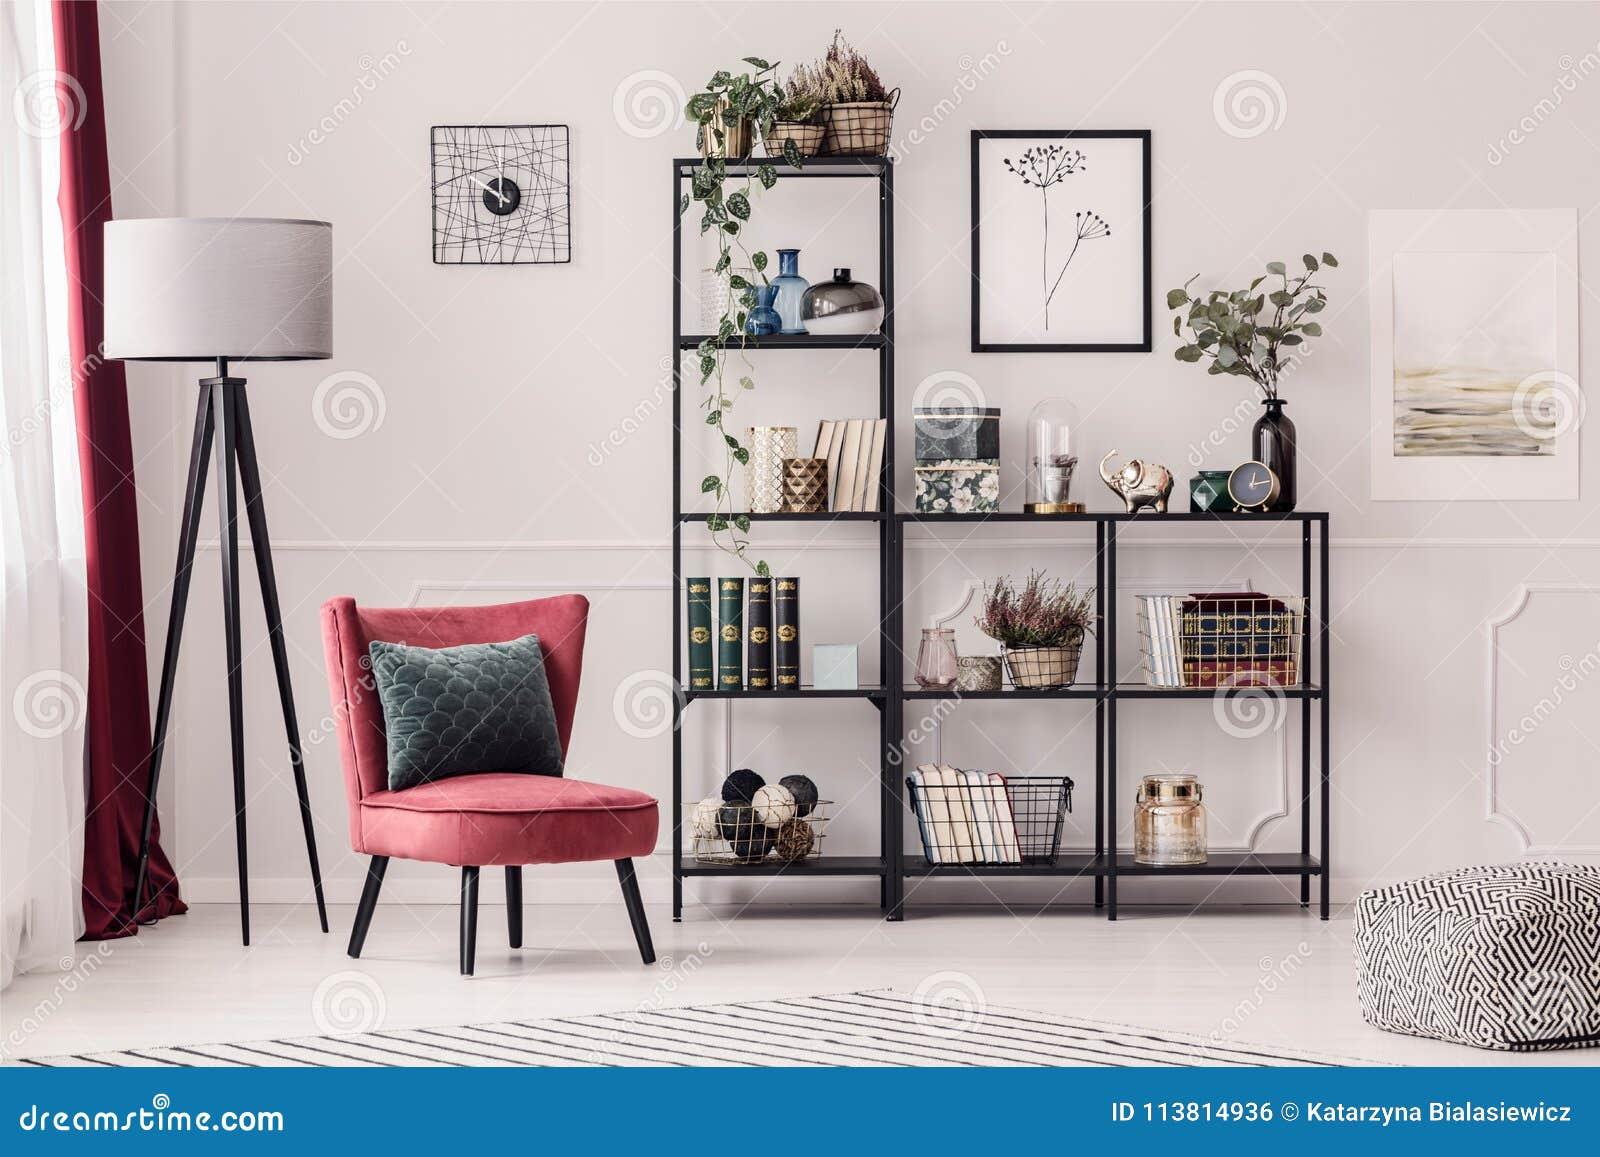 Bookshelf in living room stock photo. Image of rack - 113814936